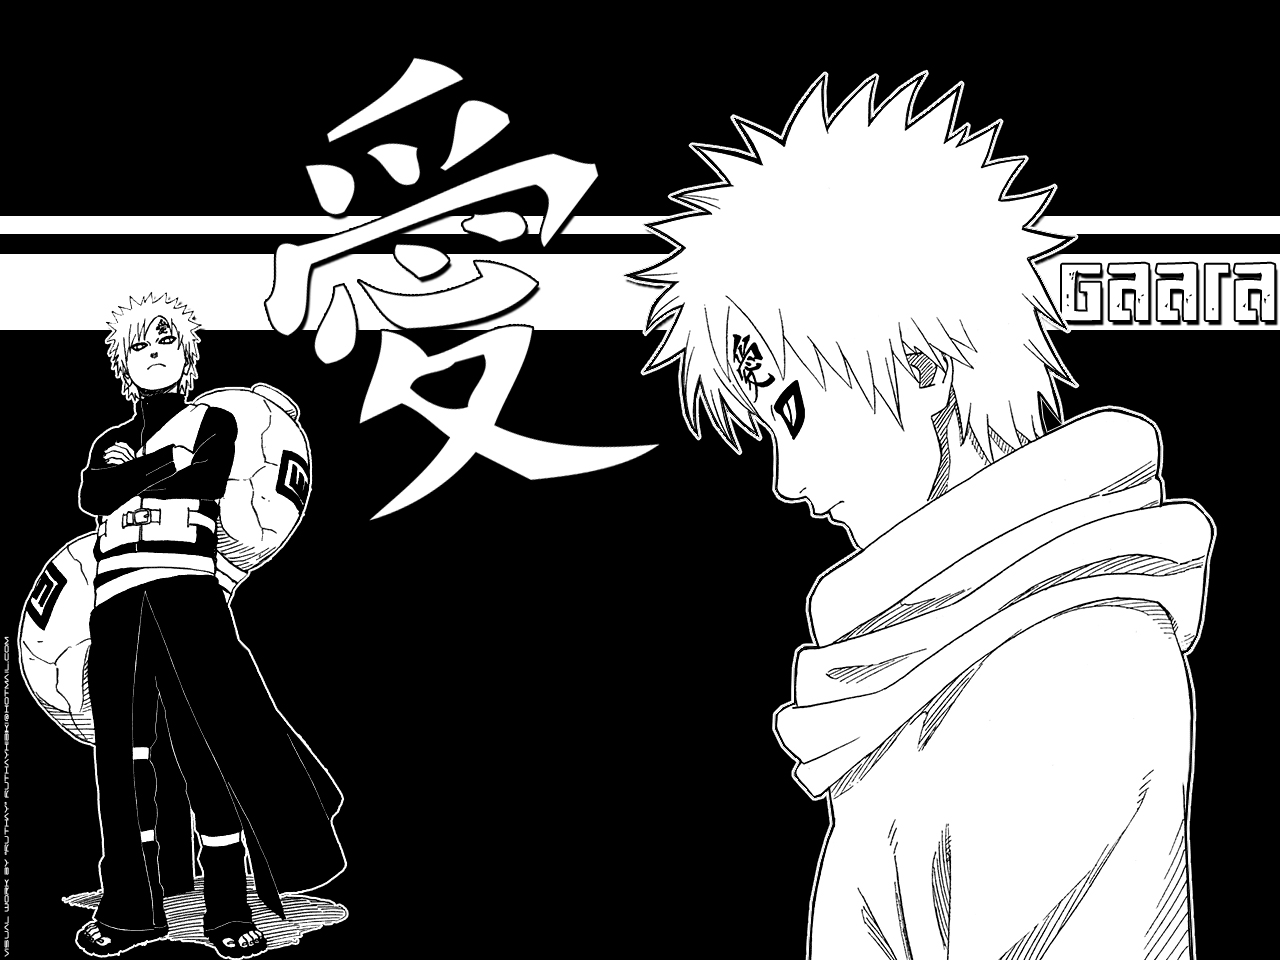 Gaara Naruto Shippuden Wallpaper 1280x960